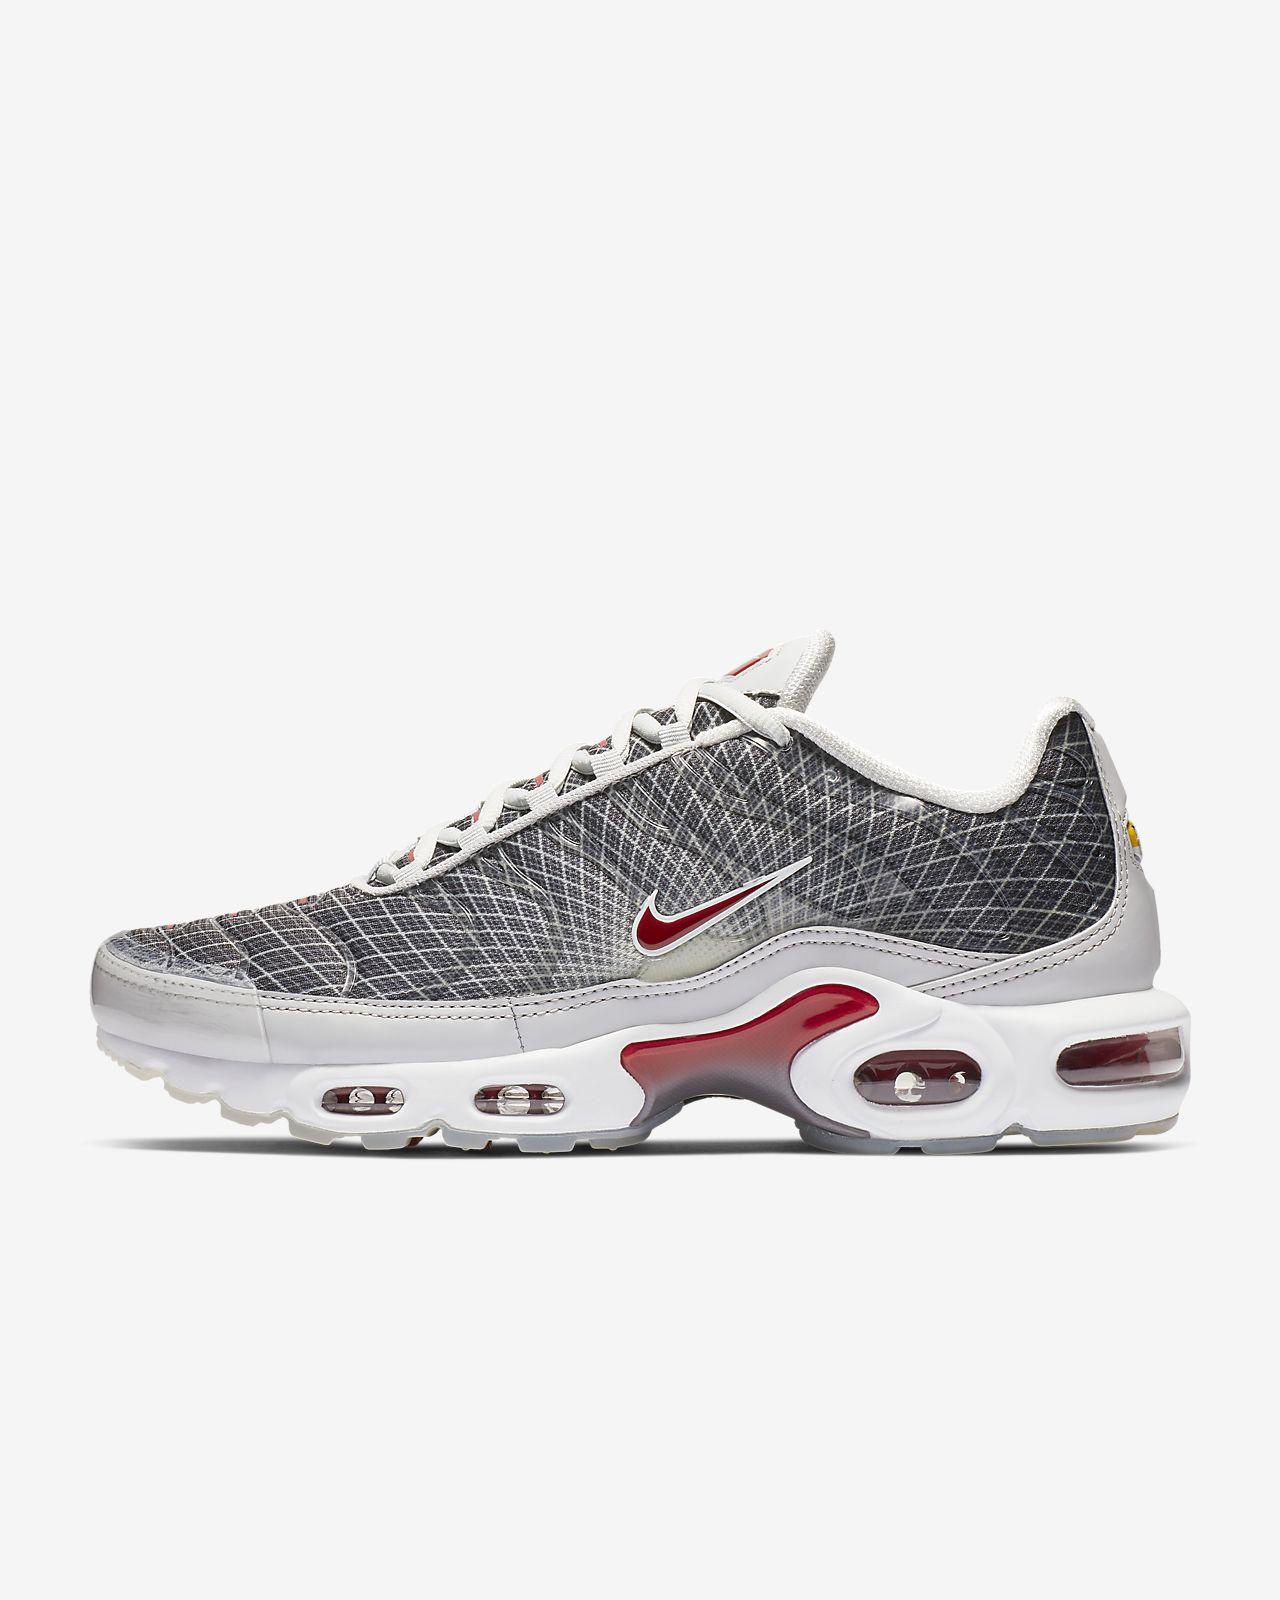 Nike Air Max Plus OG cipő